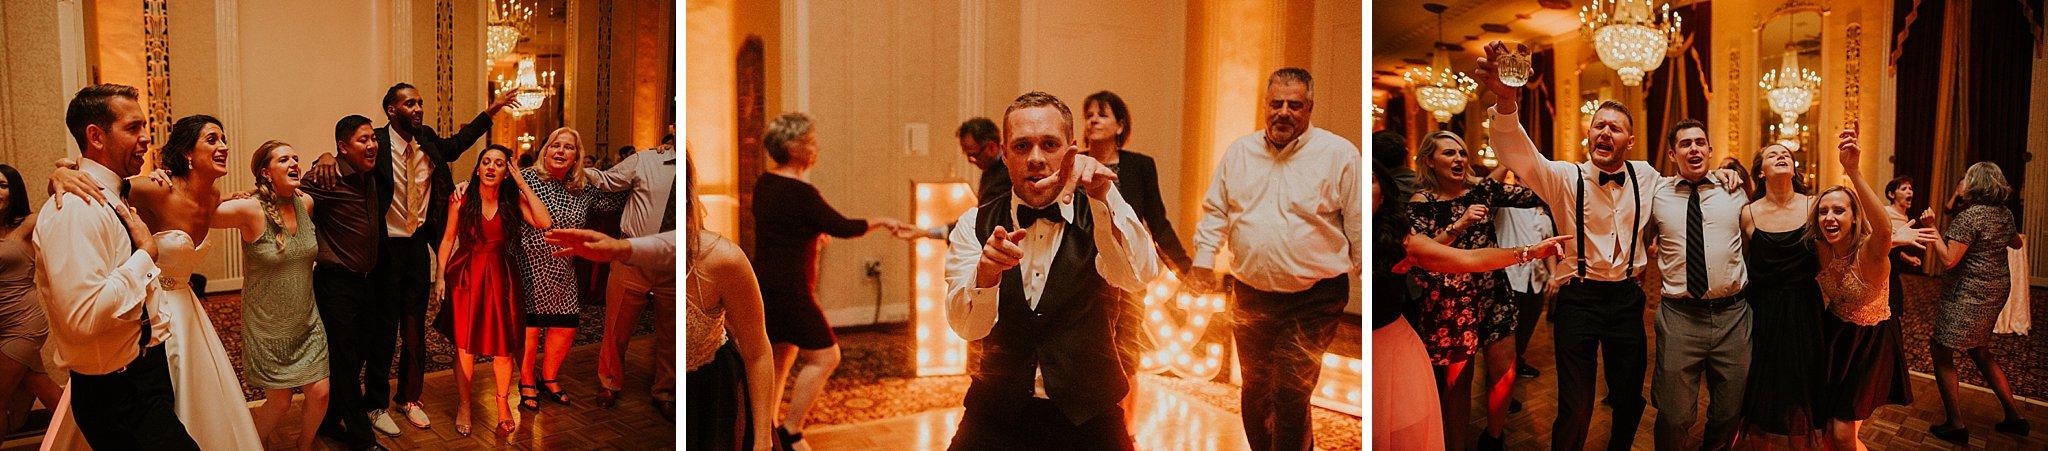 Matt-Lauren_St-Marys_Hilton-City-Center-Milwaukee-Wedding_liller-photo_0098.jpg